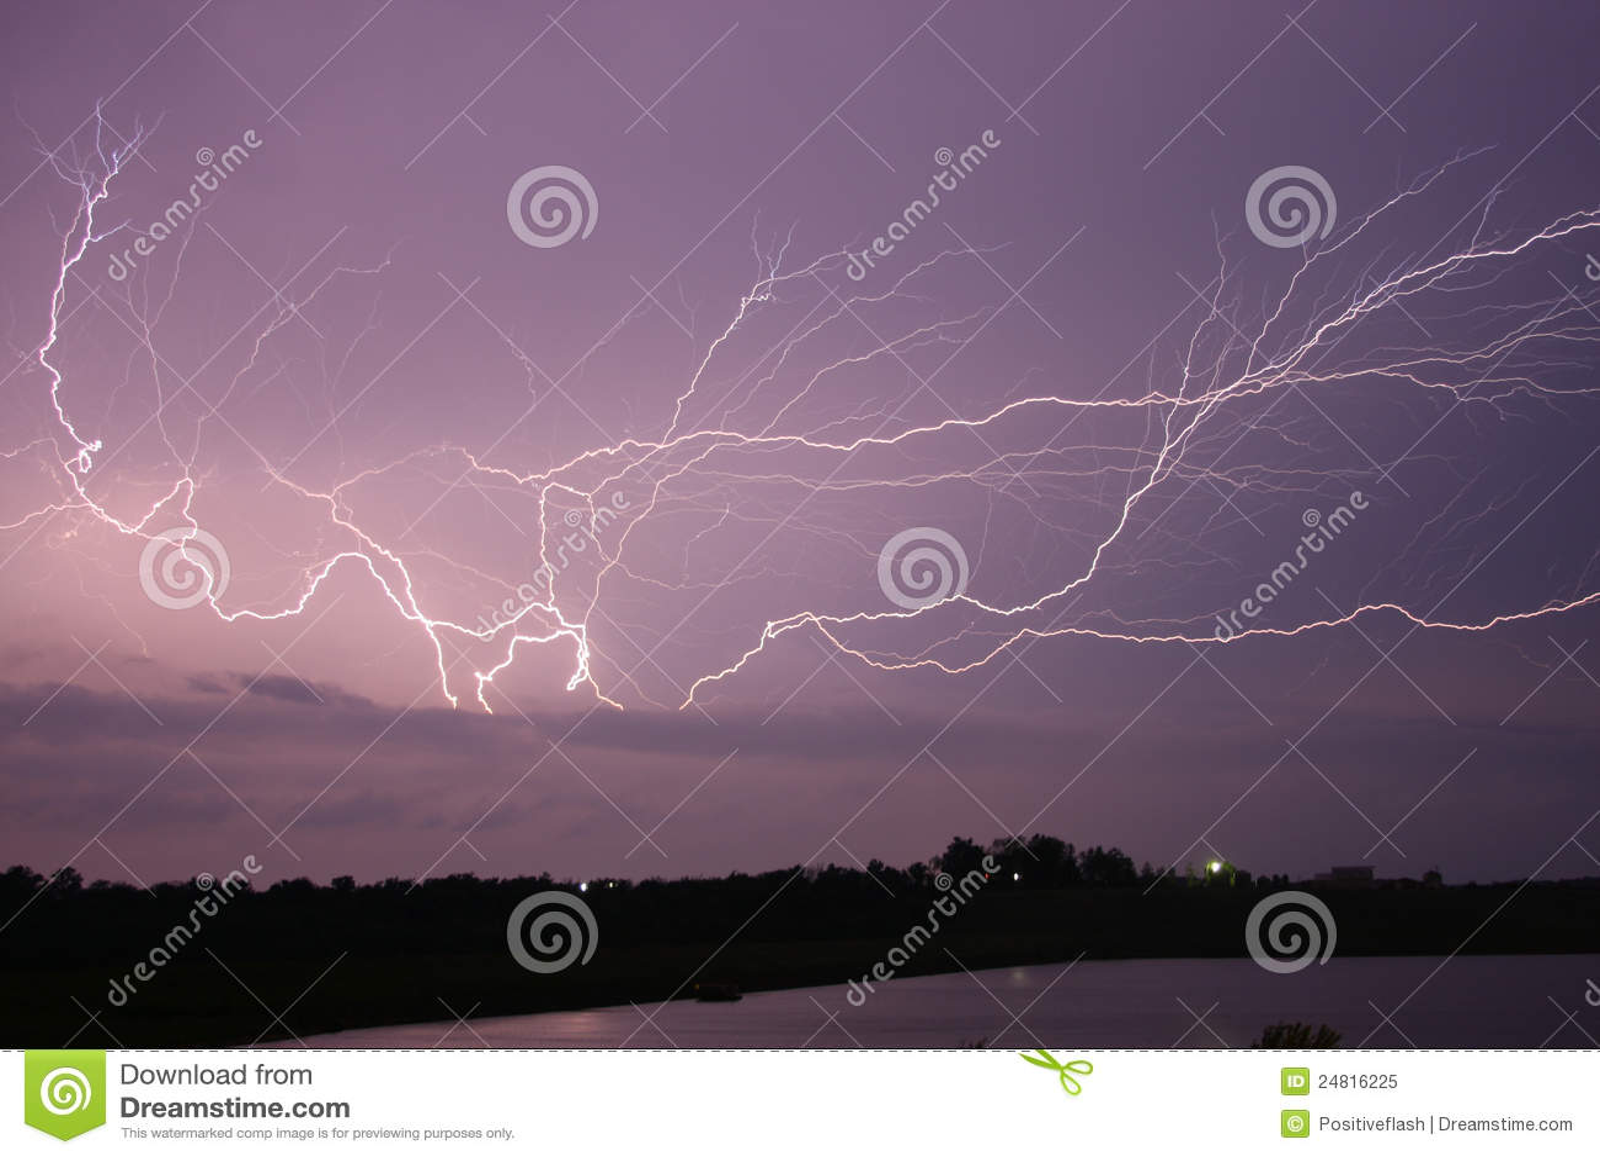 Royalty free stock photo: lightning across the sky